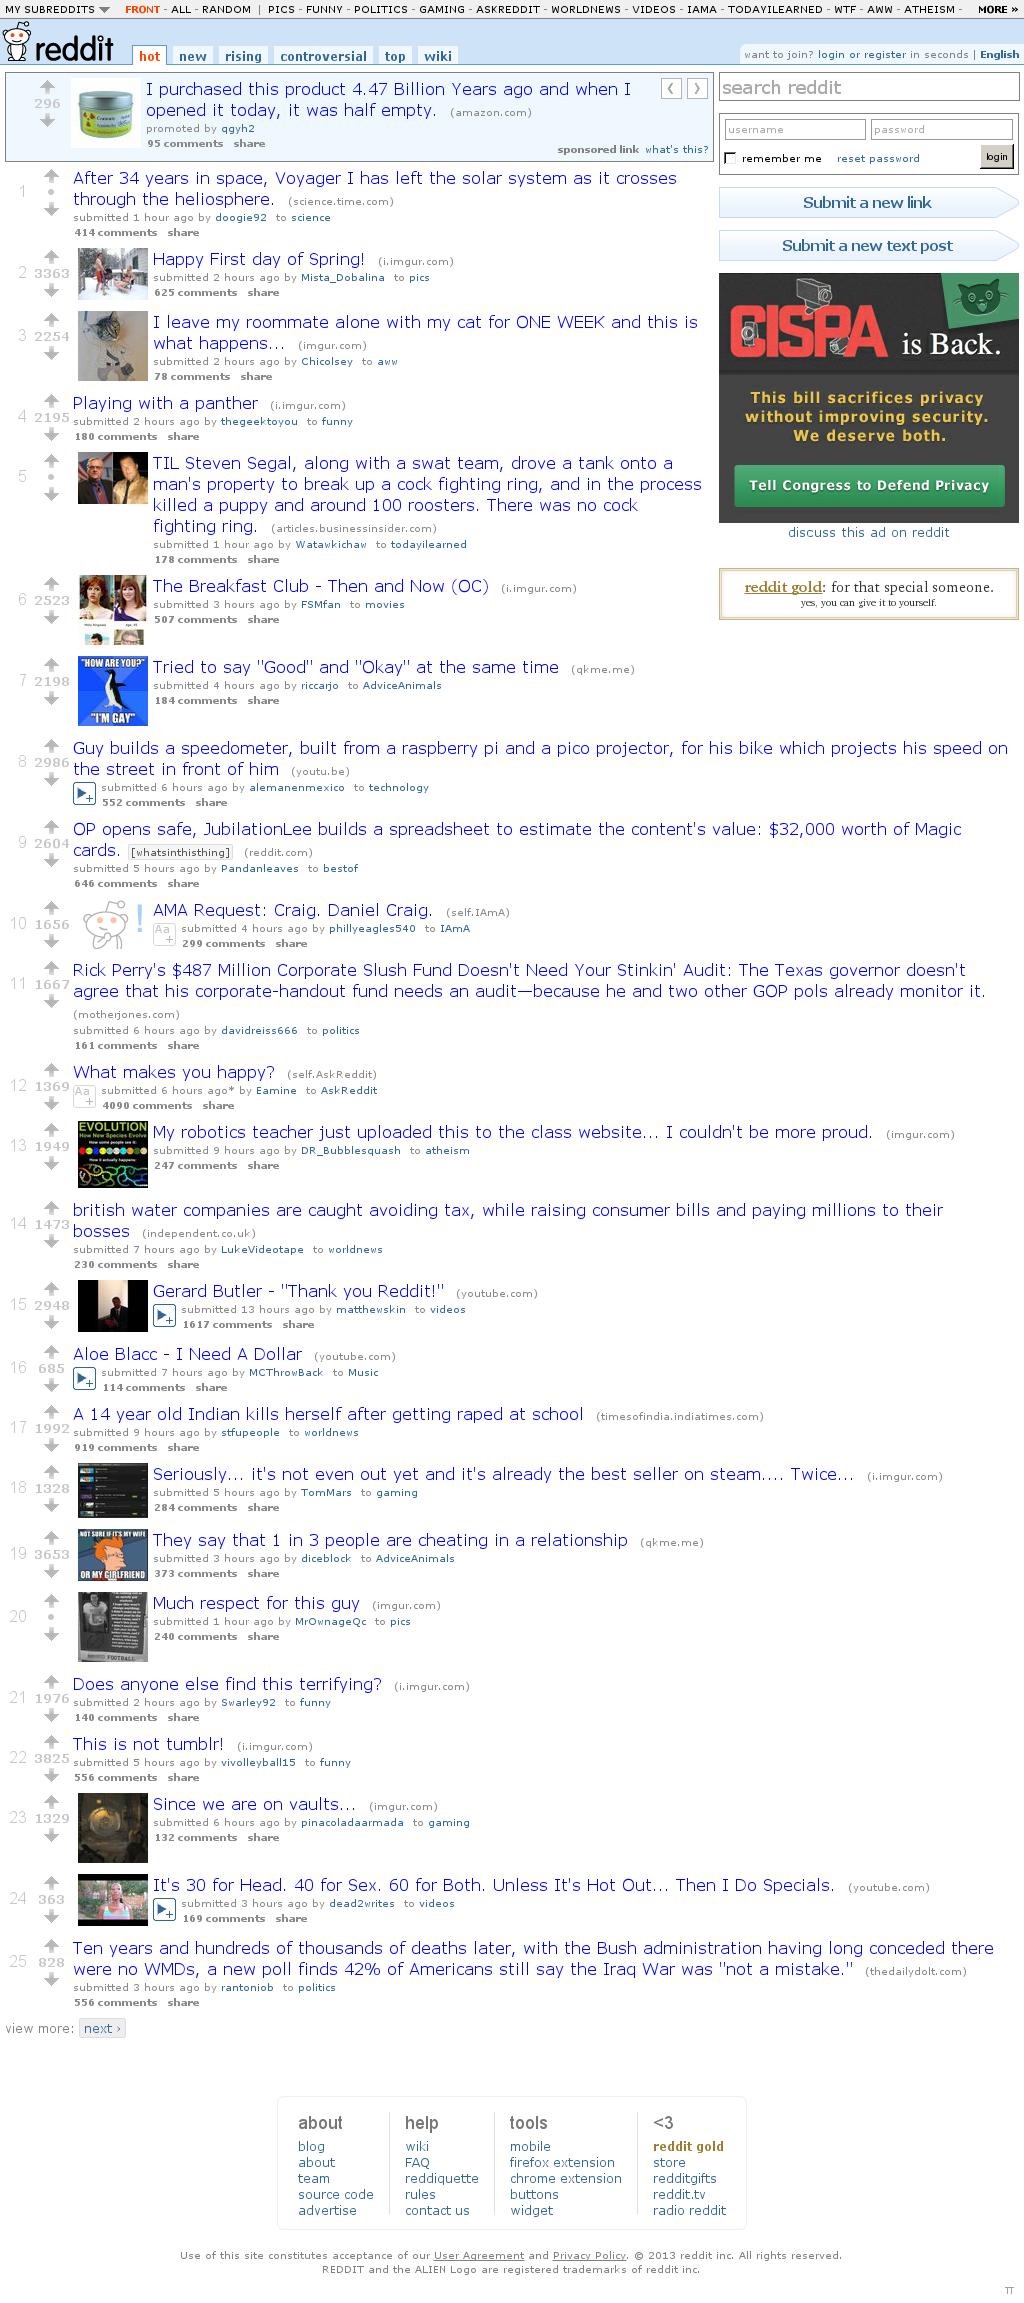 Reddit at Wednesday March 20, 2013, 5:24 p.m. UTC